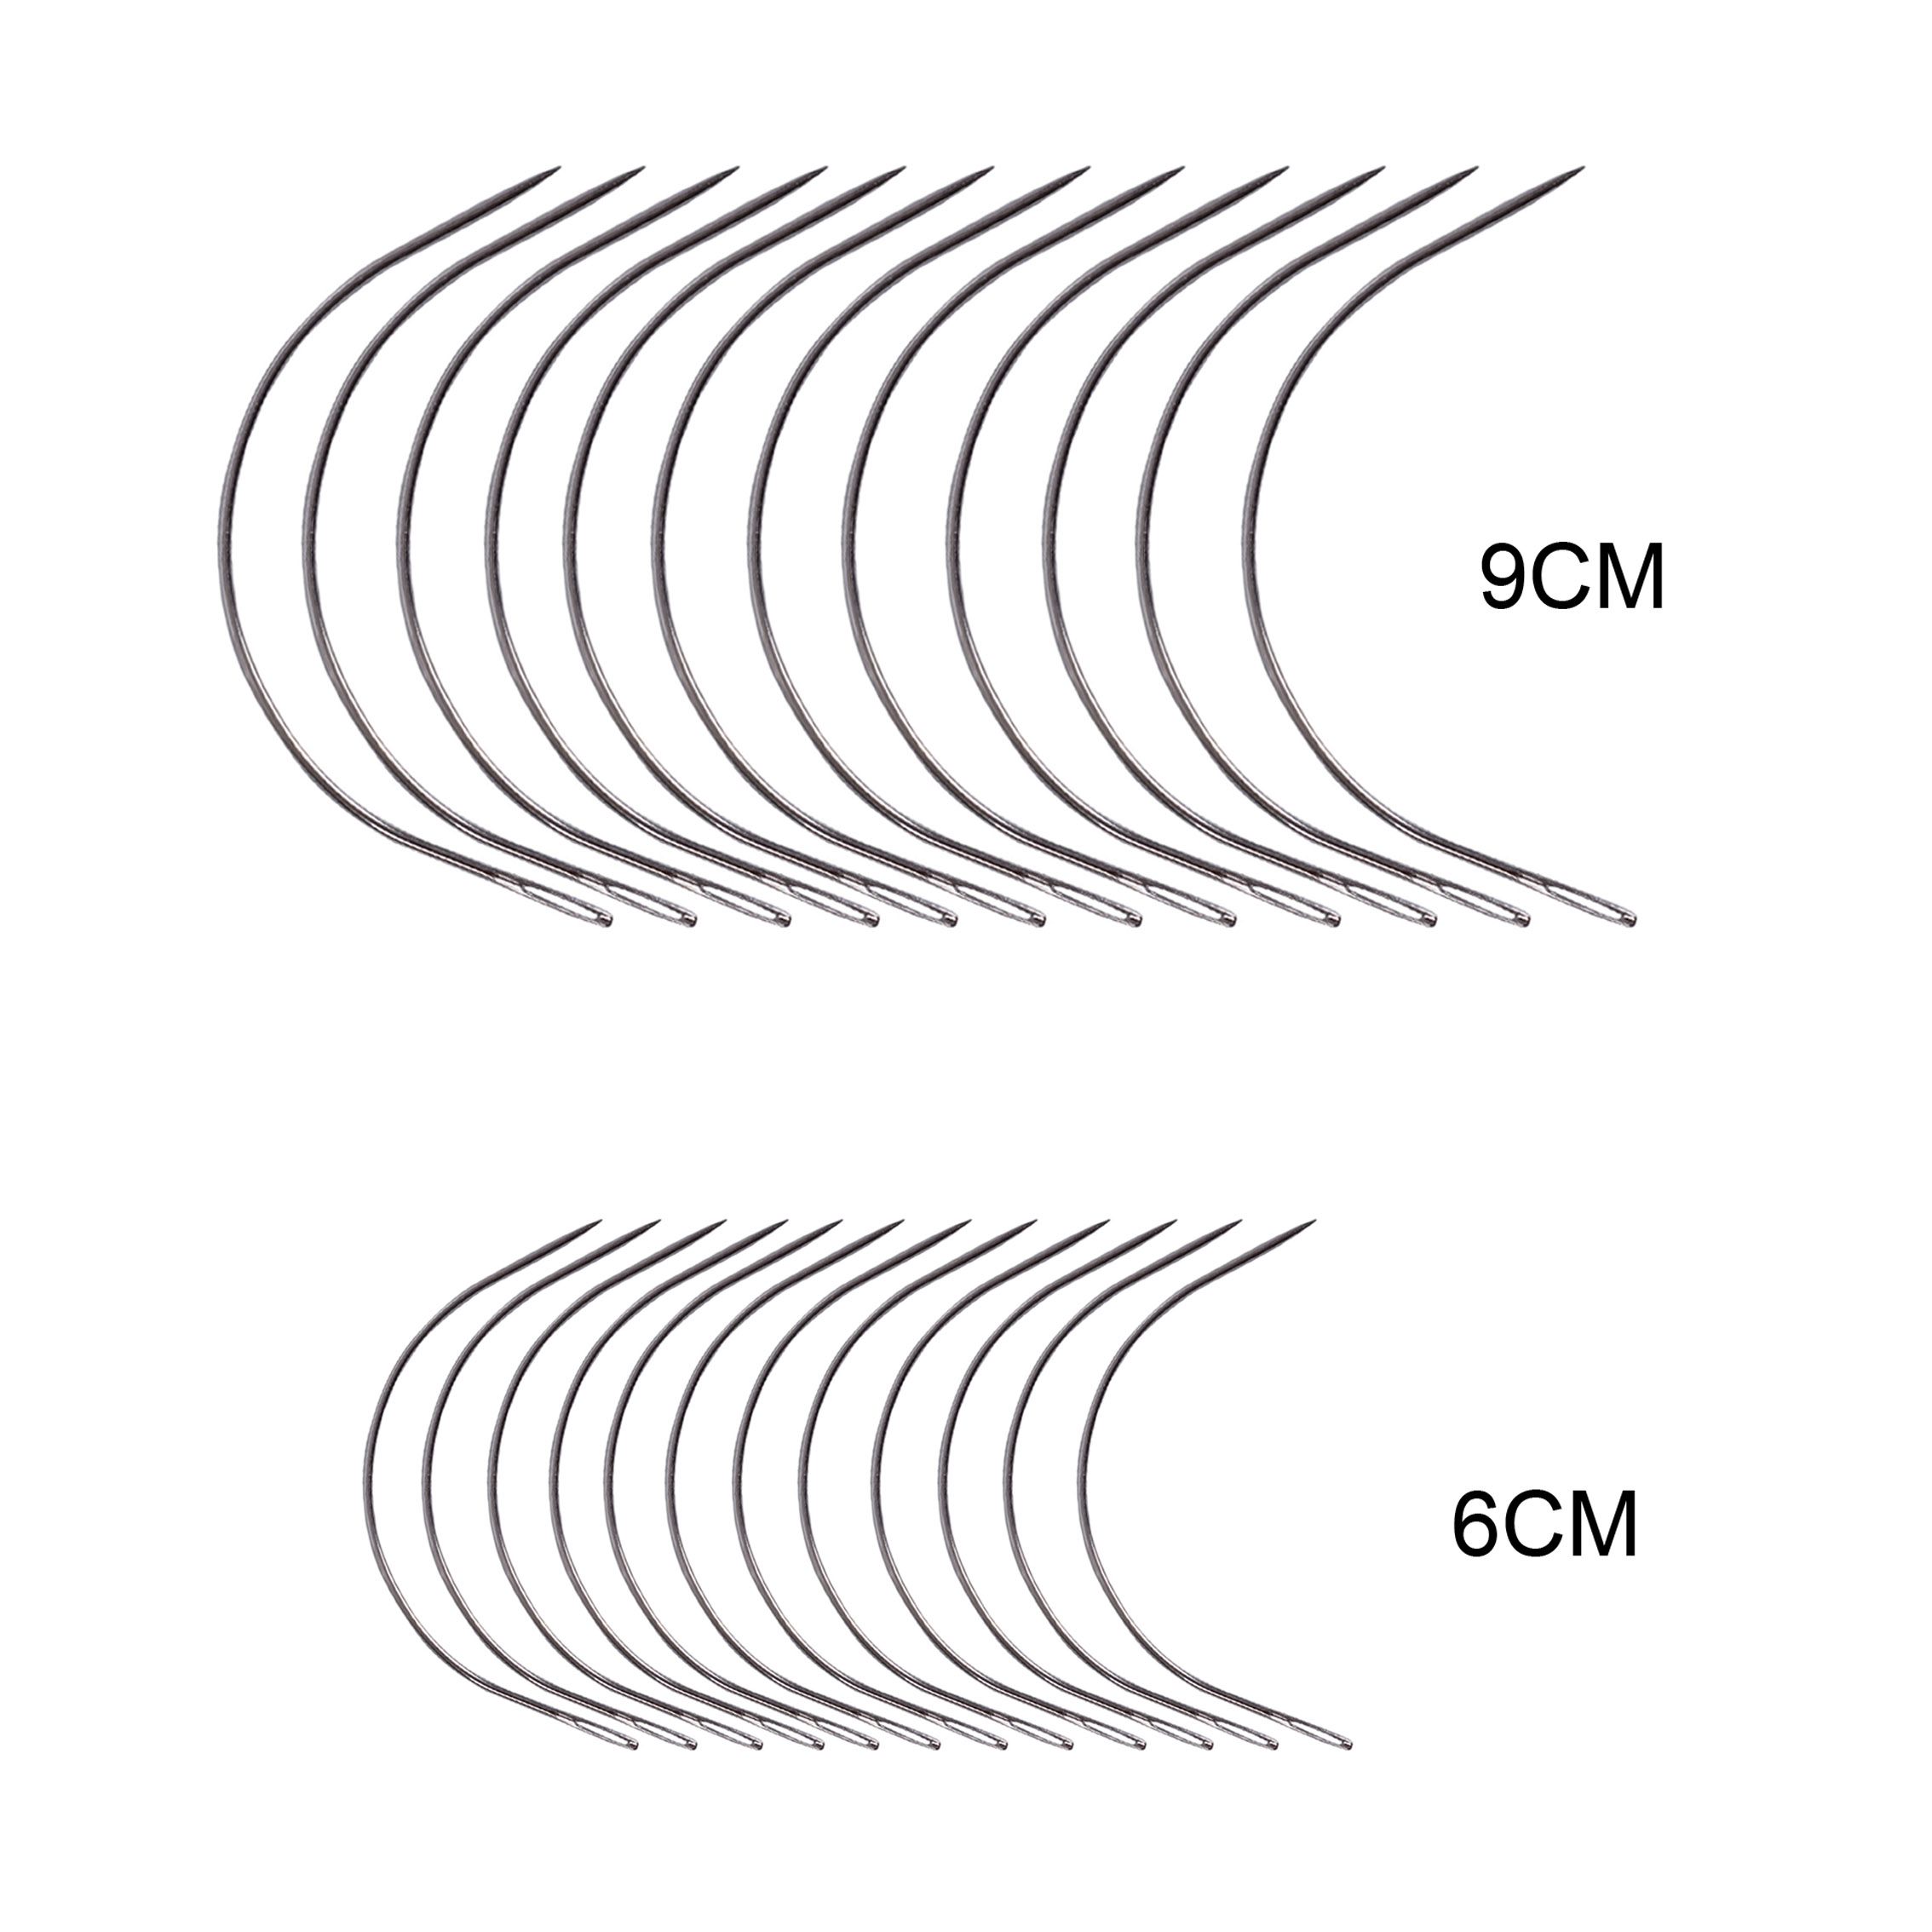 24 Pcs/bag Large 9cm 6cm C Shape Curved Needles Wig Making Crochet Braids Ventilating Hair Weaving Needle